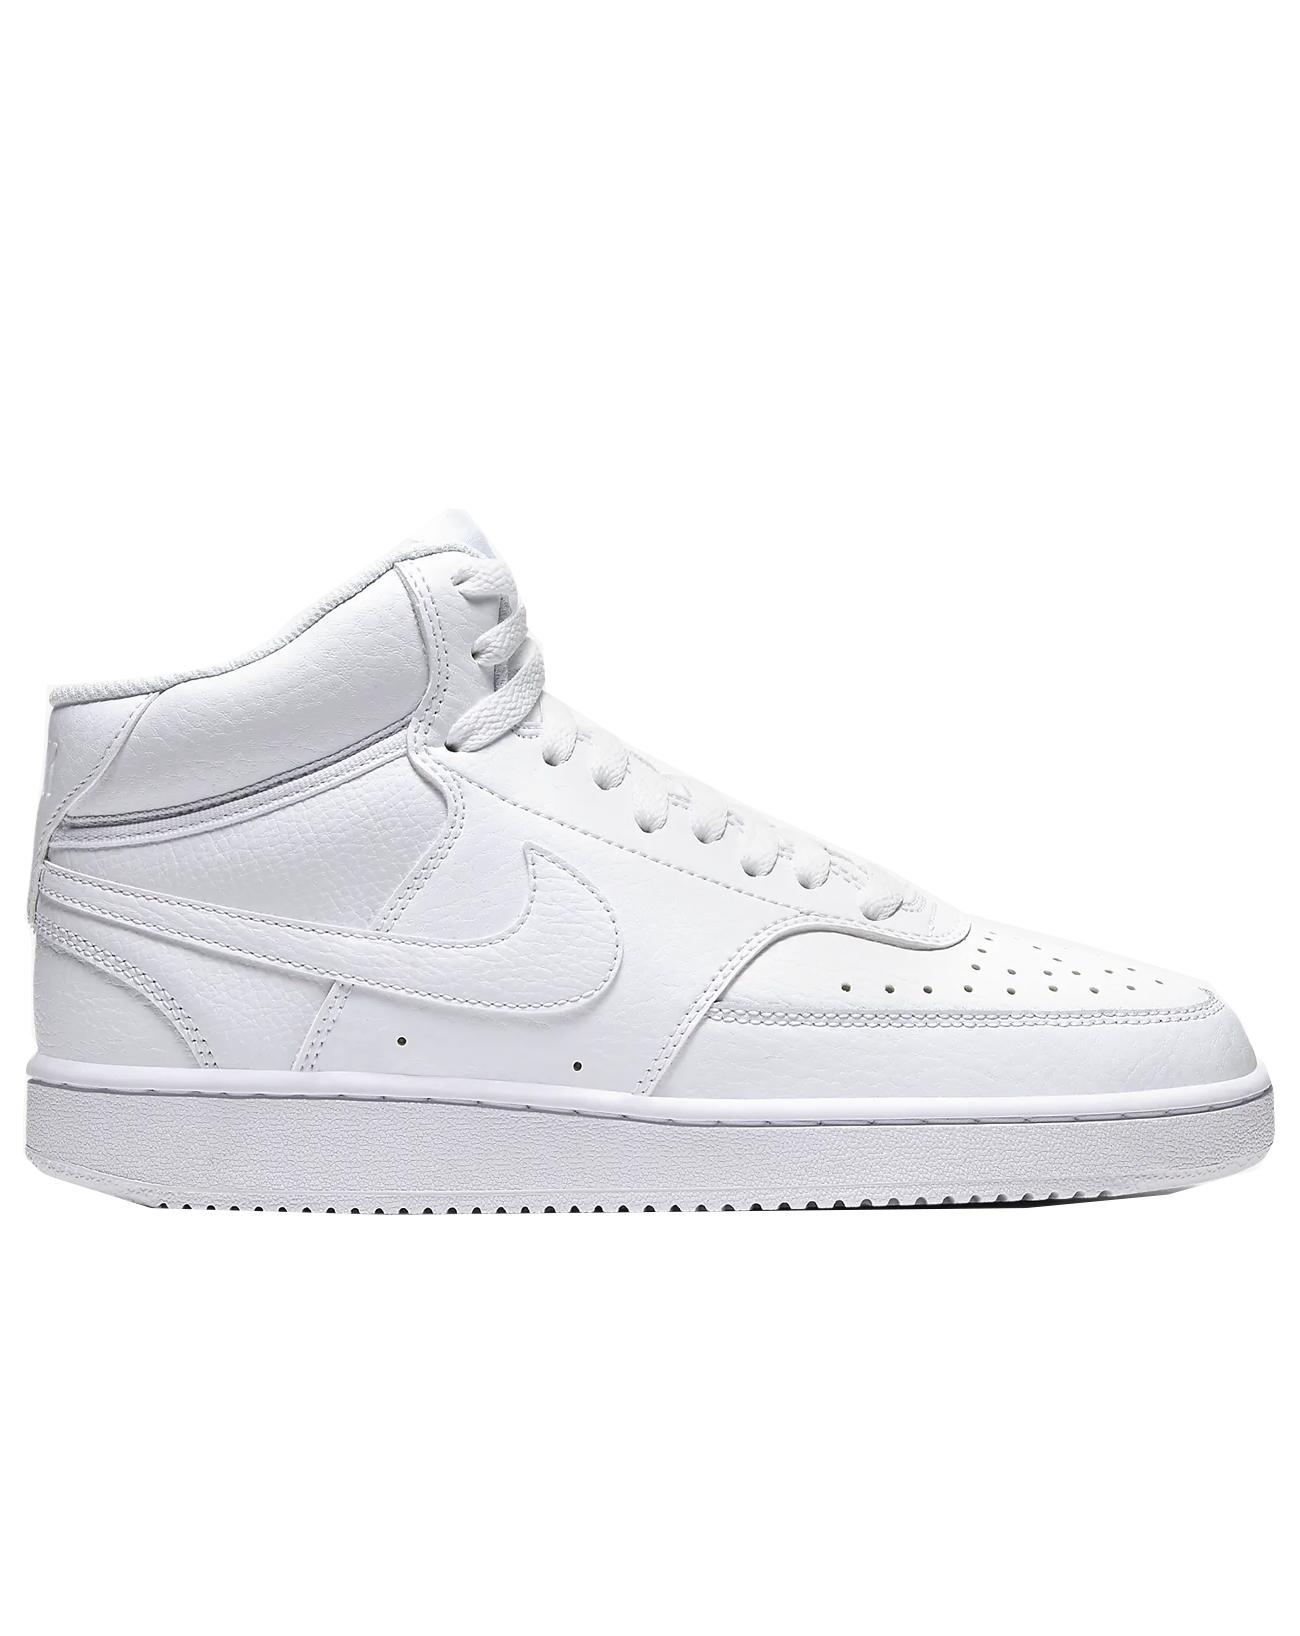 sneaker trends for autumn 2021